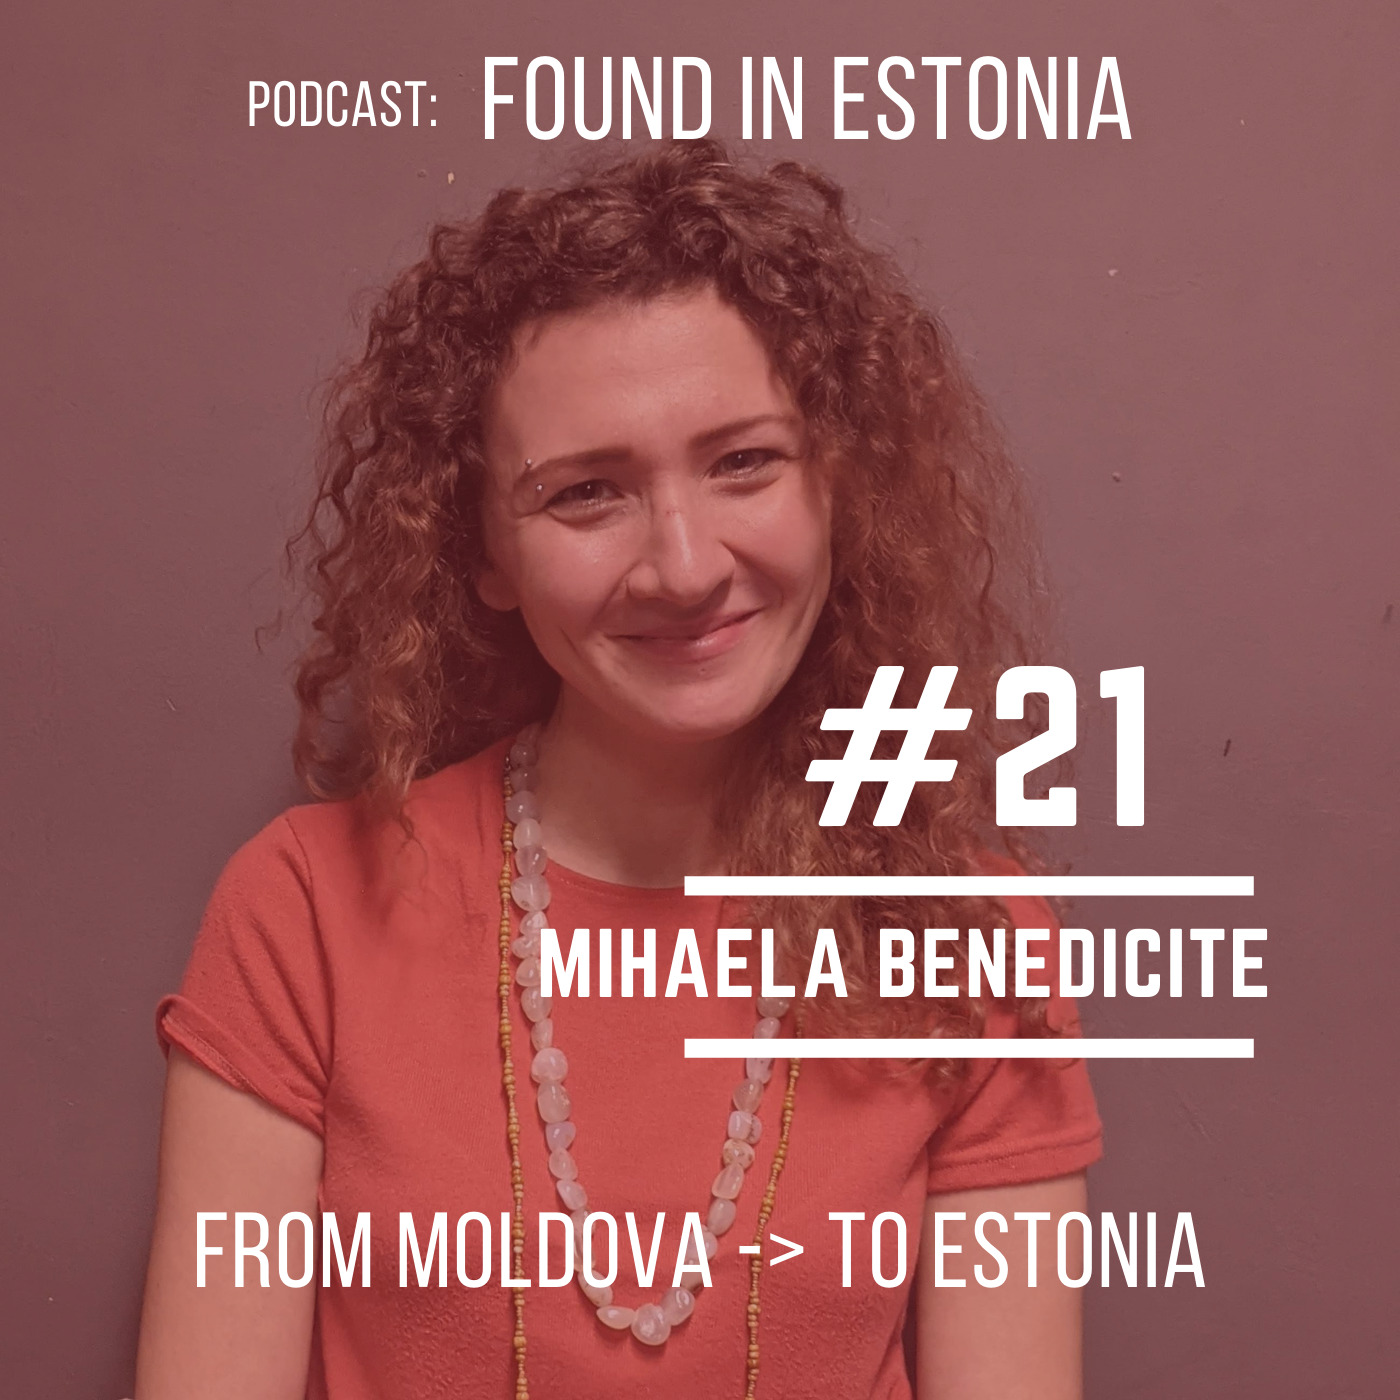 #21 Mihaela Benedicitie from Moldova to Estonia